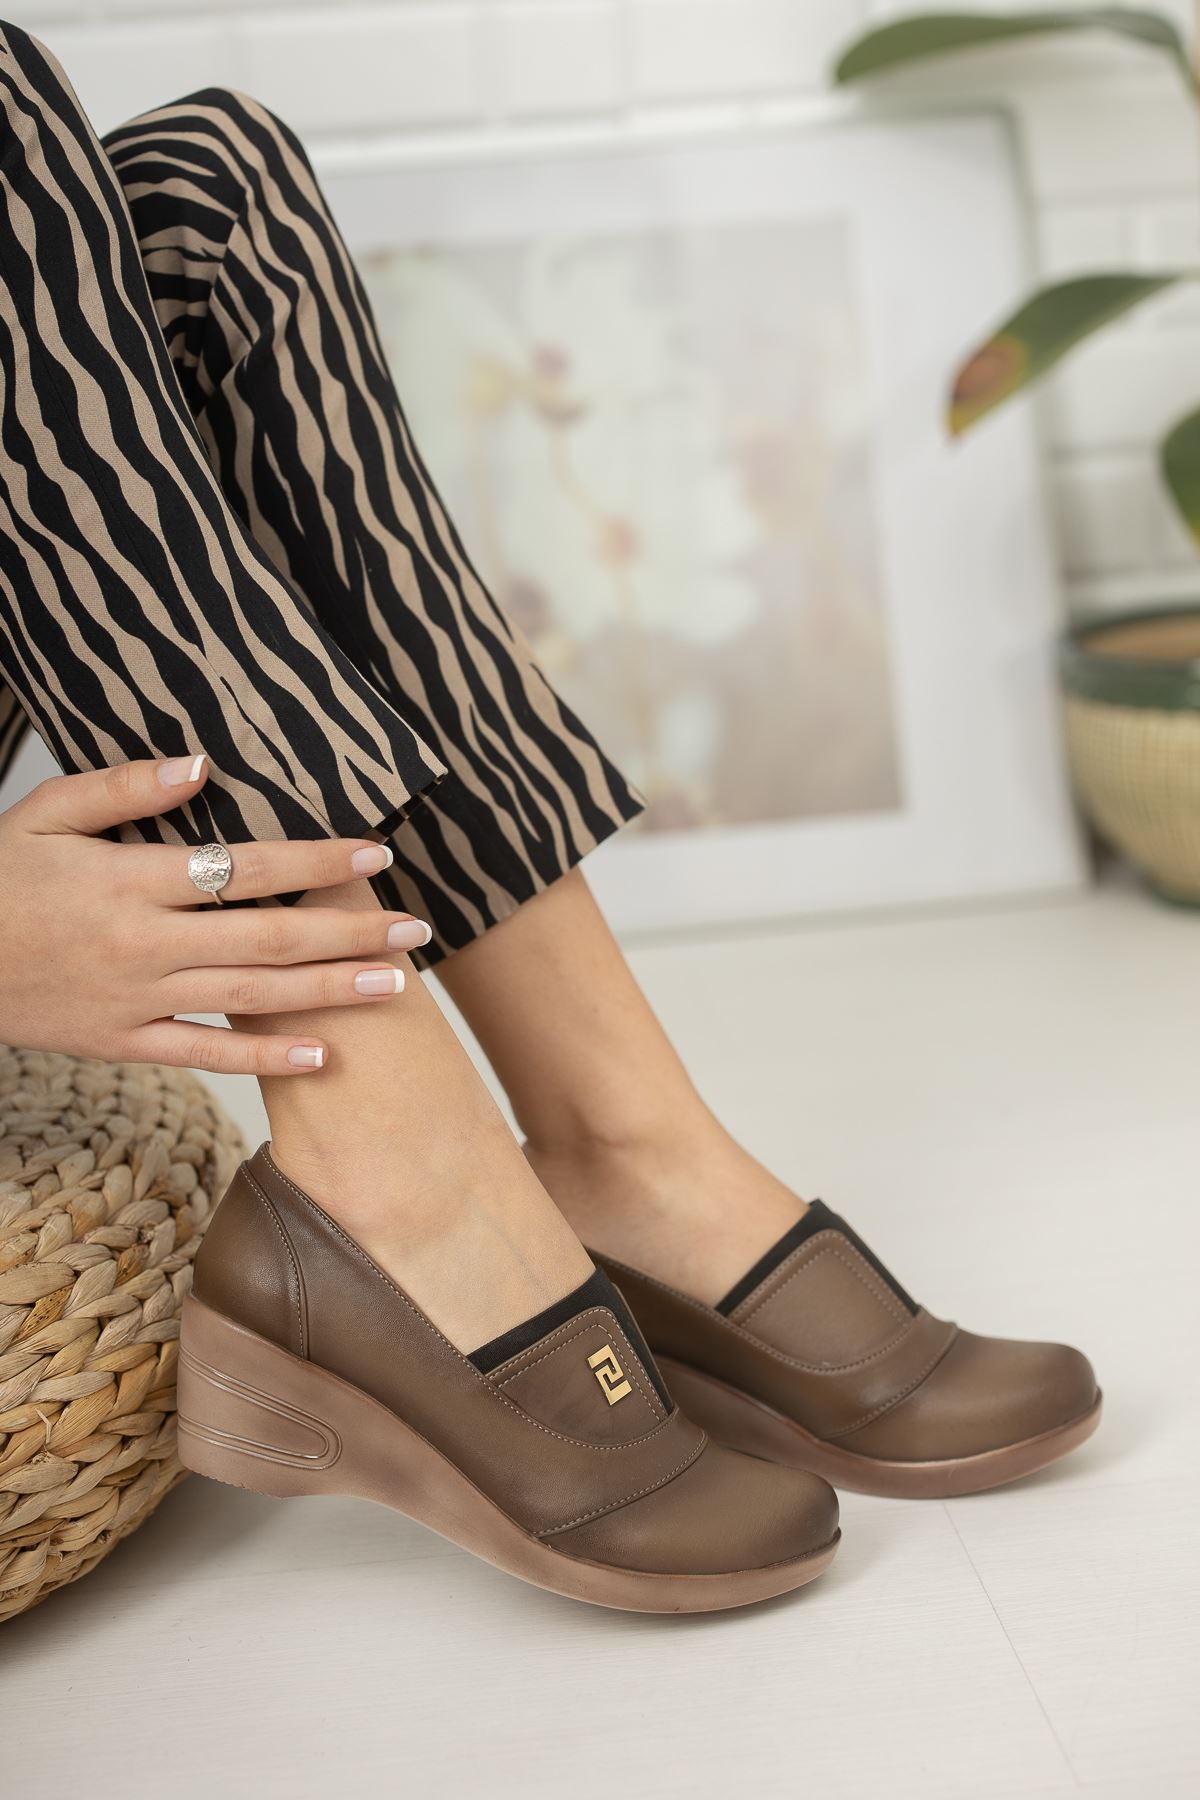 Ortapedik Pedli Dolgu Topuk Vizon Cilt Ayakkabı